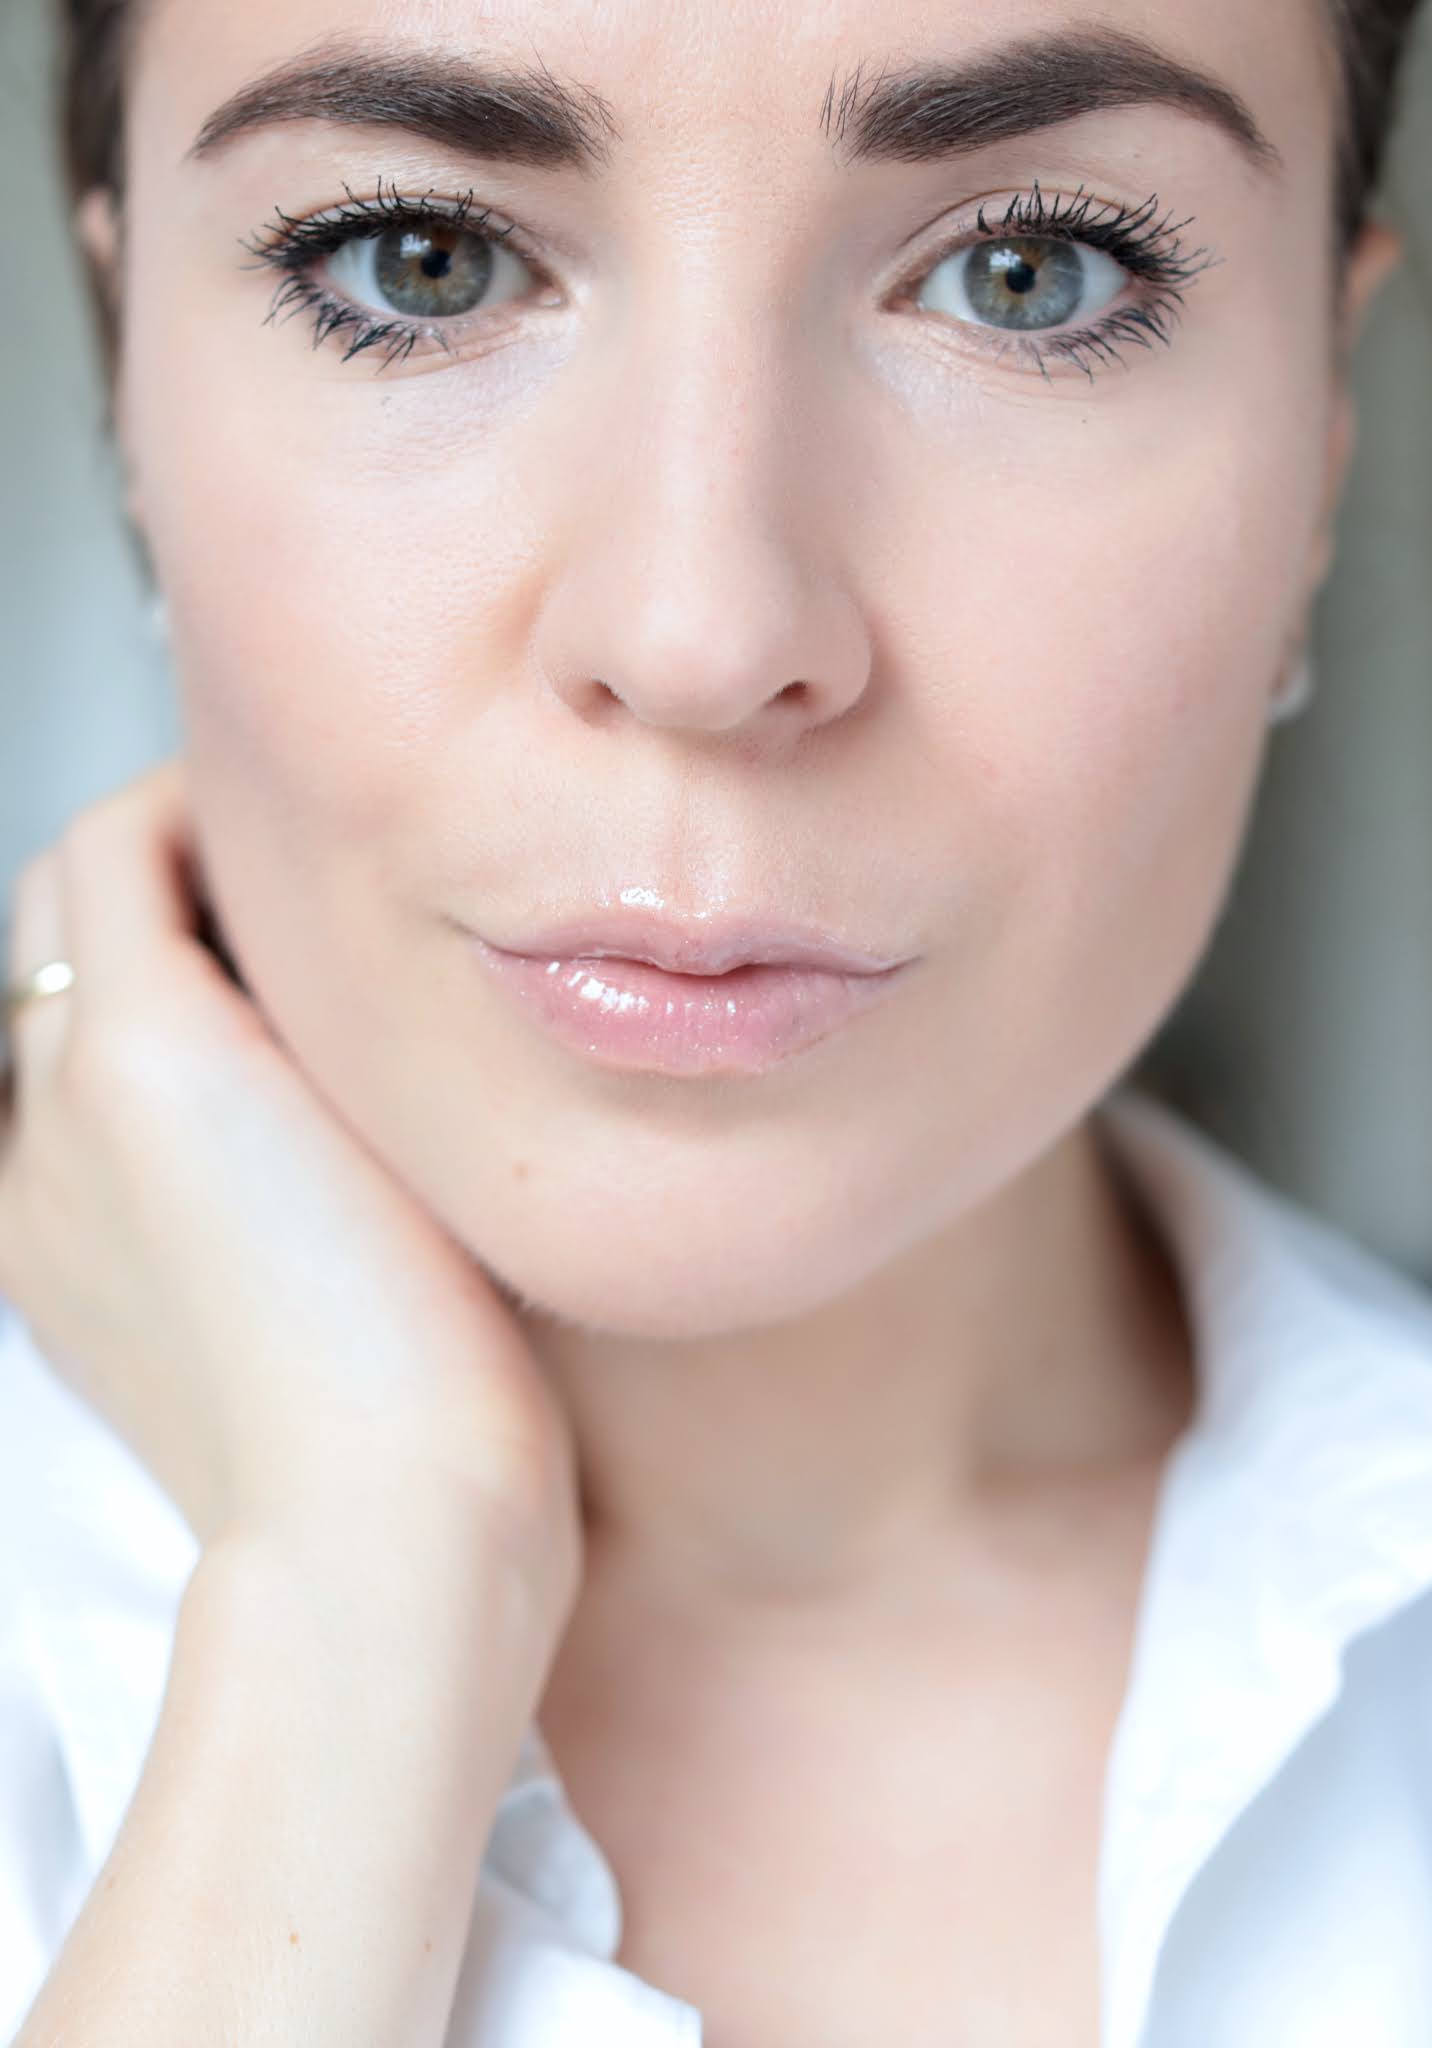 Laura Mercier Flawless Face Fusion Concealer